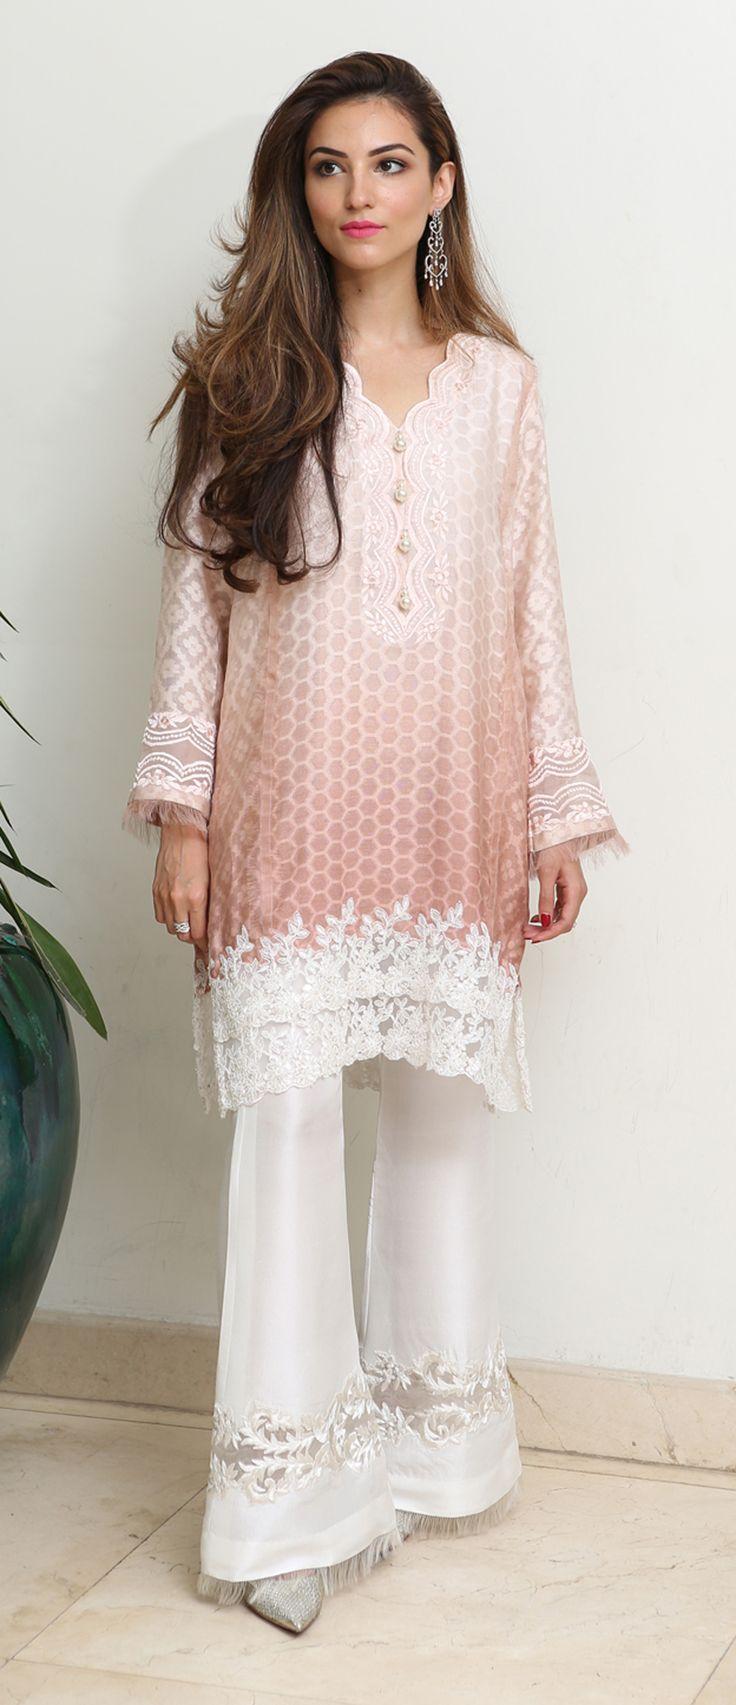 Numra-Waqas-Understated-elegance-in-Rema-Shehrbano.jpg 2,624×6,081 pixels